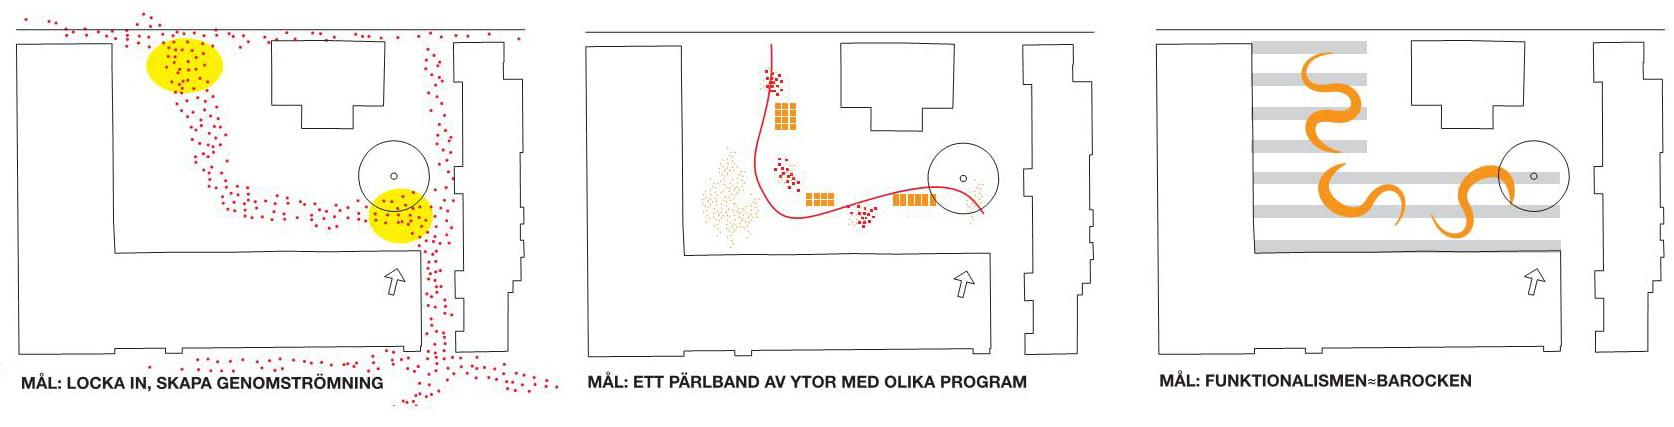 JakobMommasParkDiagram2